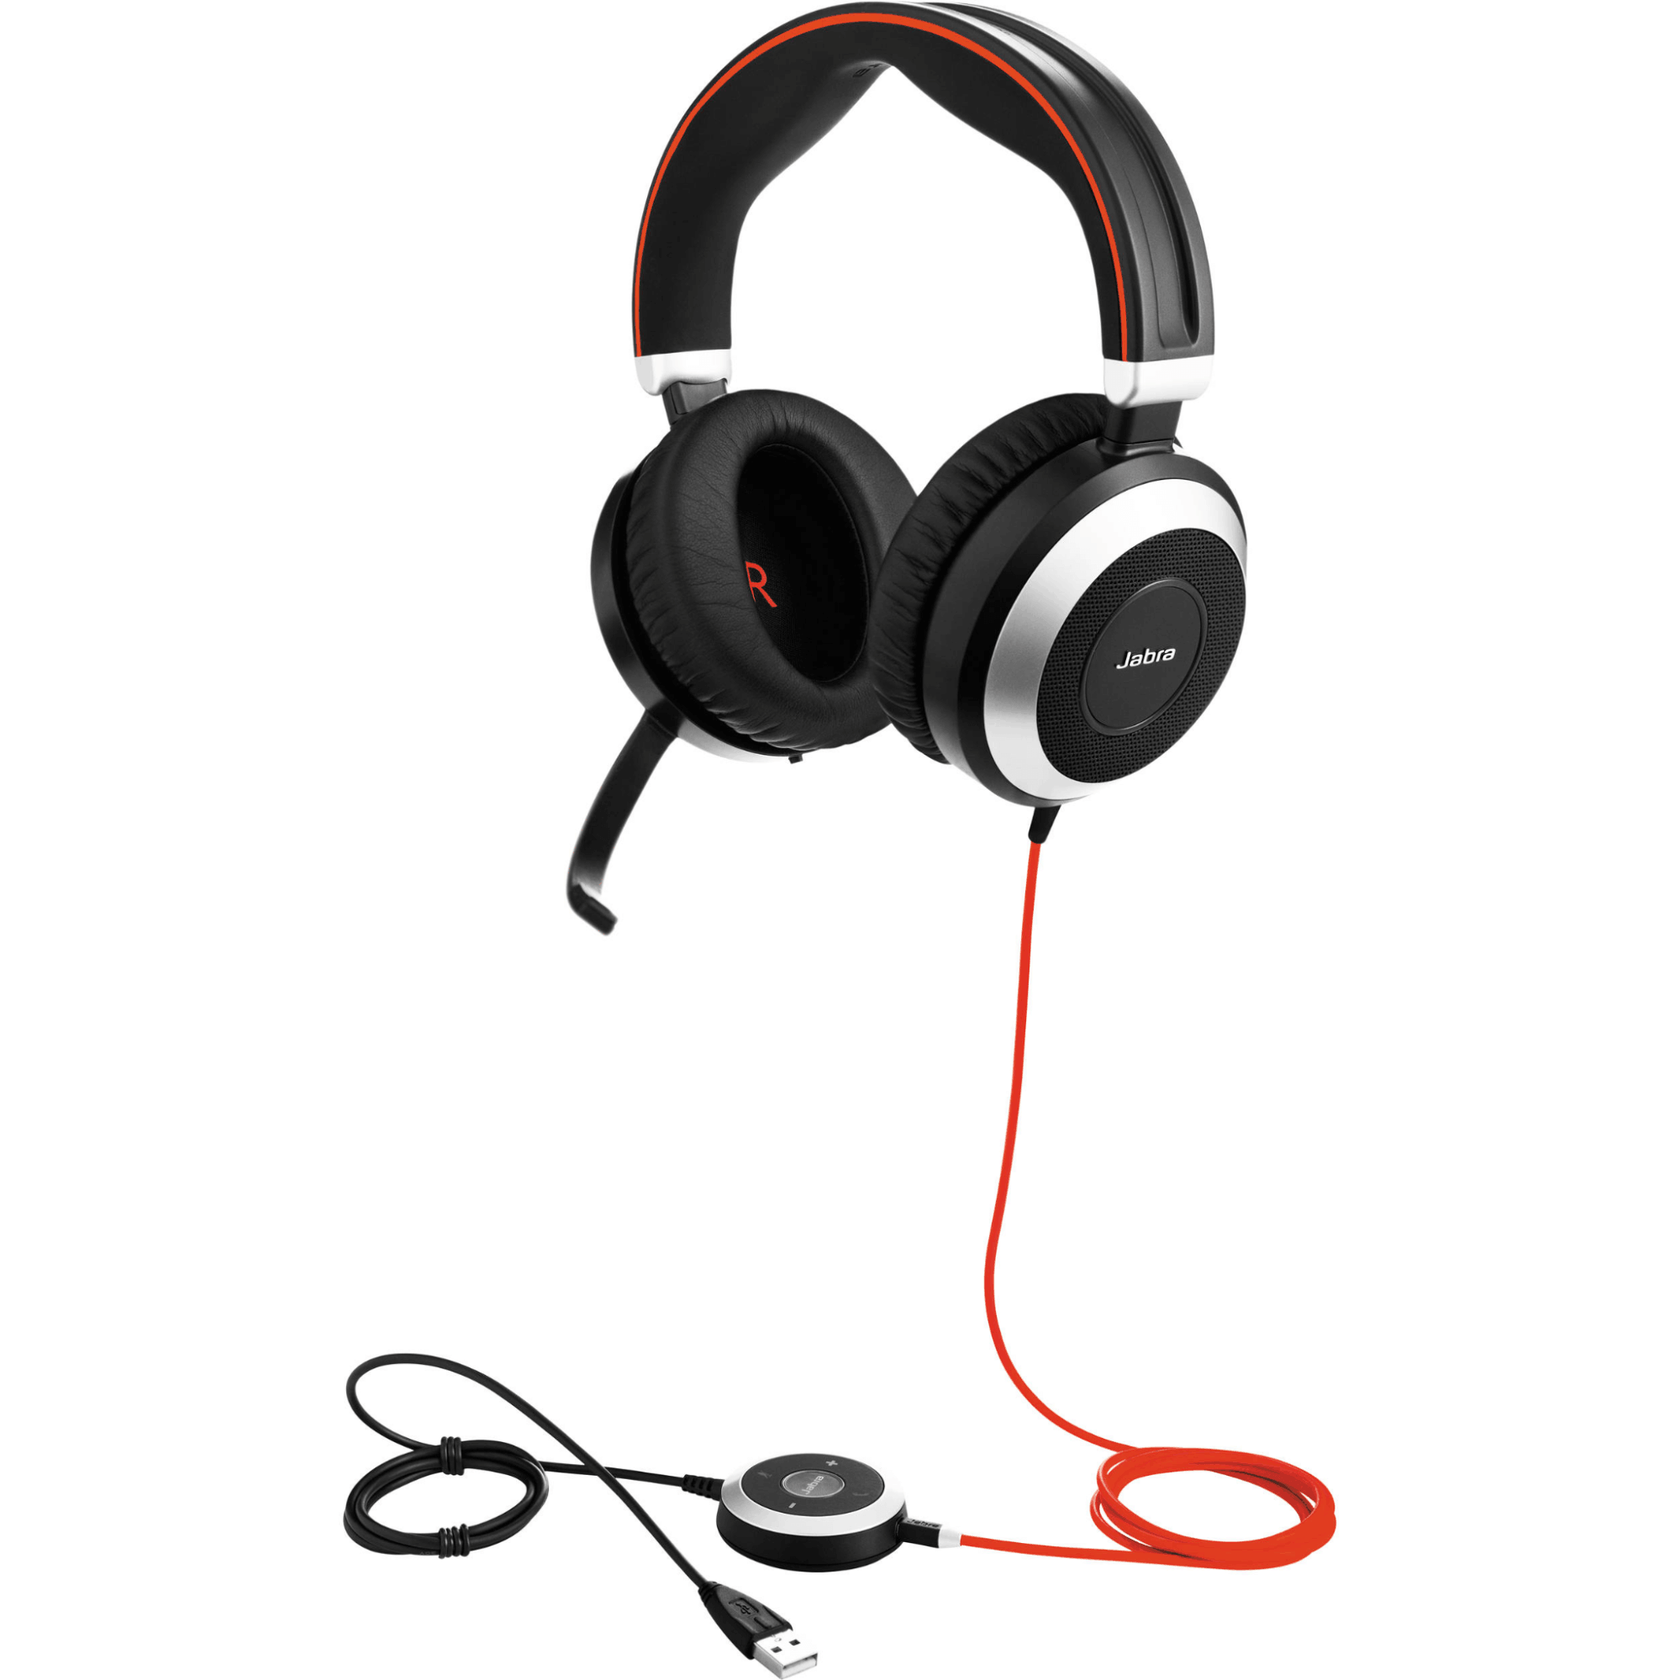 Jabra Evolve 80 headphones